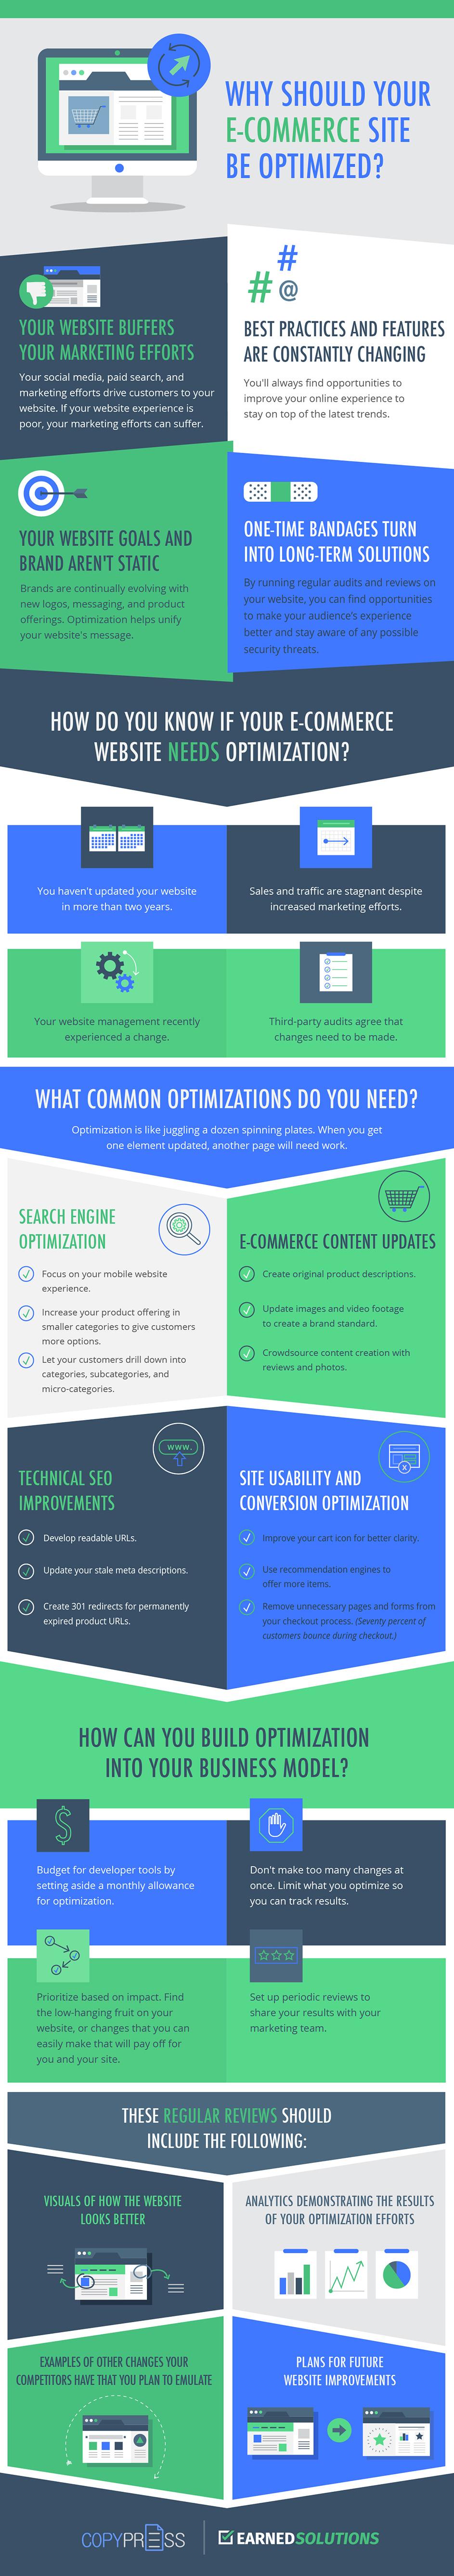 Ecommerce Optimization Infographic.jpg